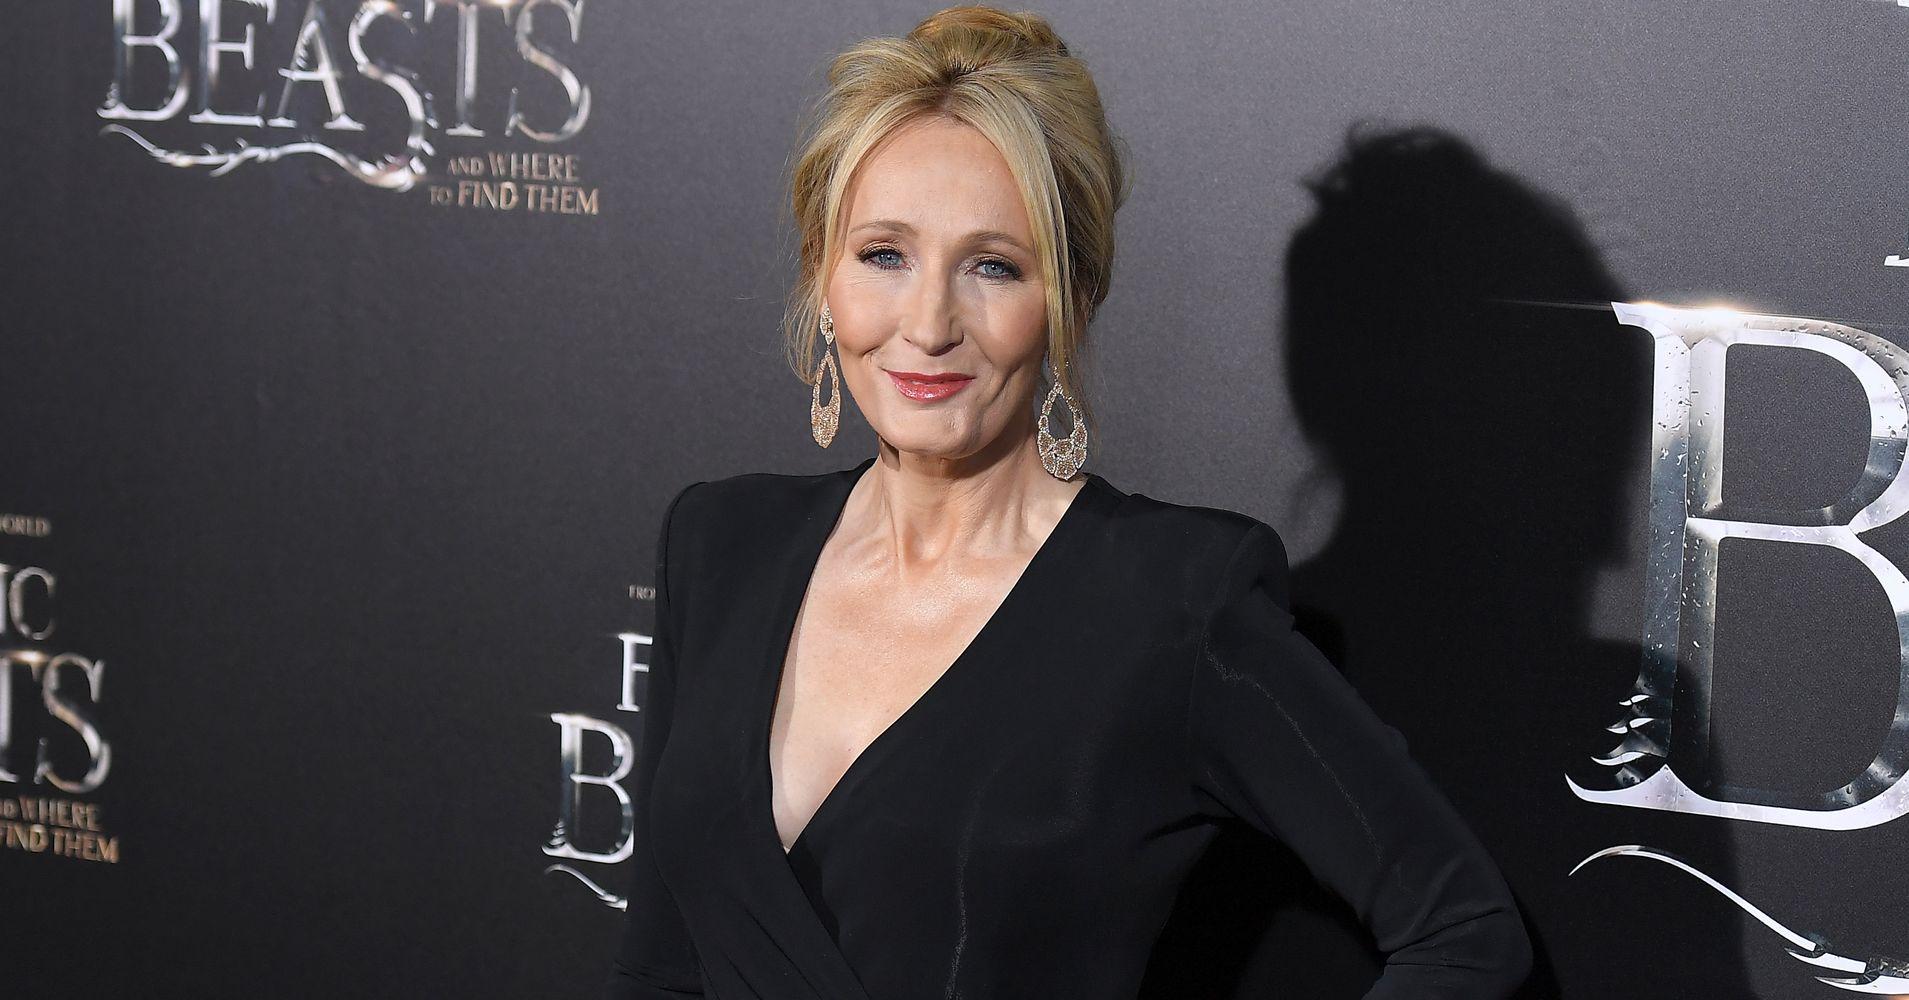 photo JK Rowling hints at more Potter books